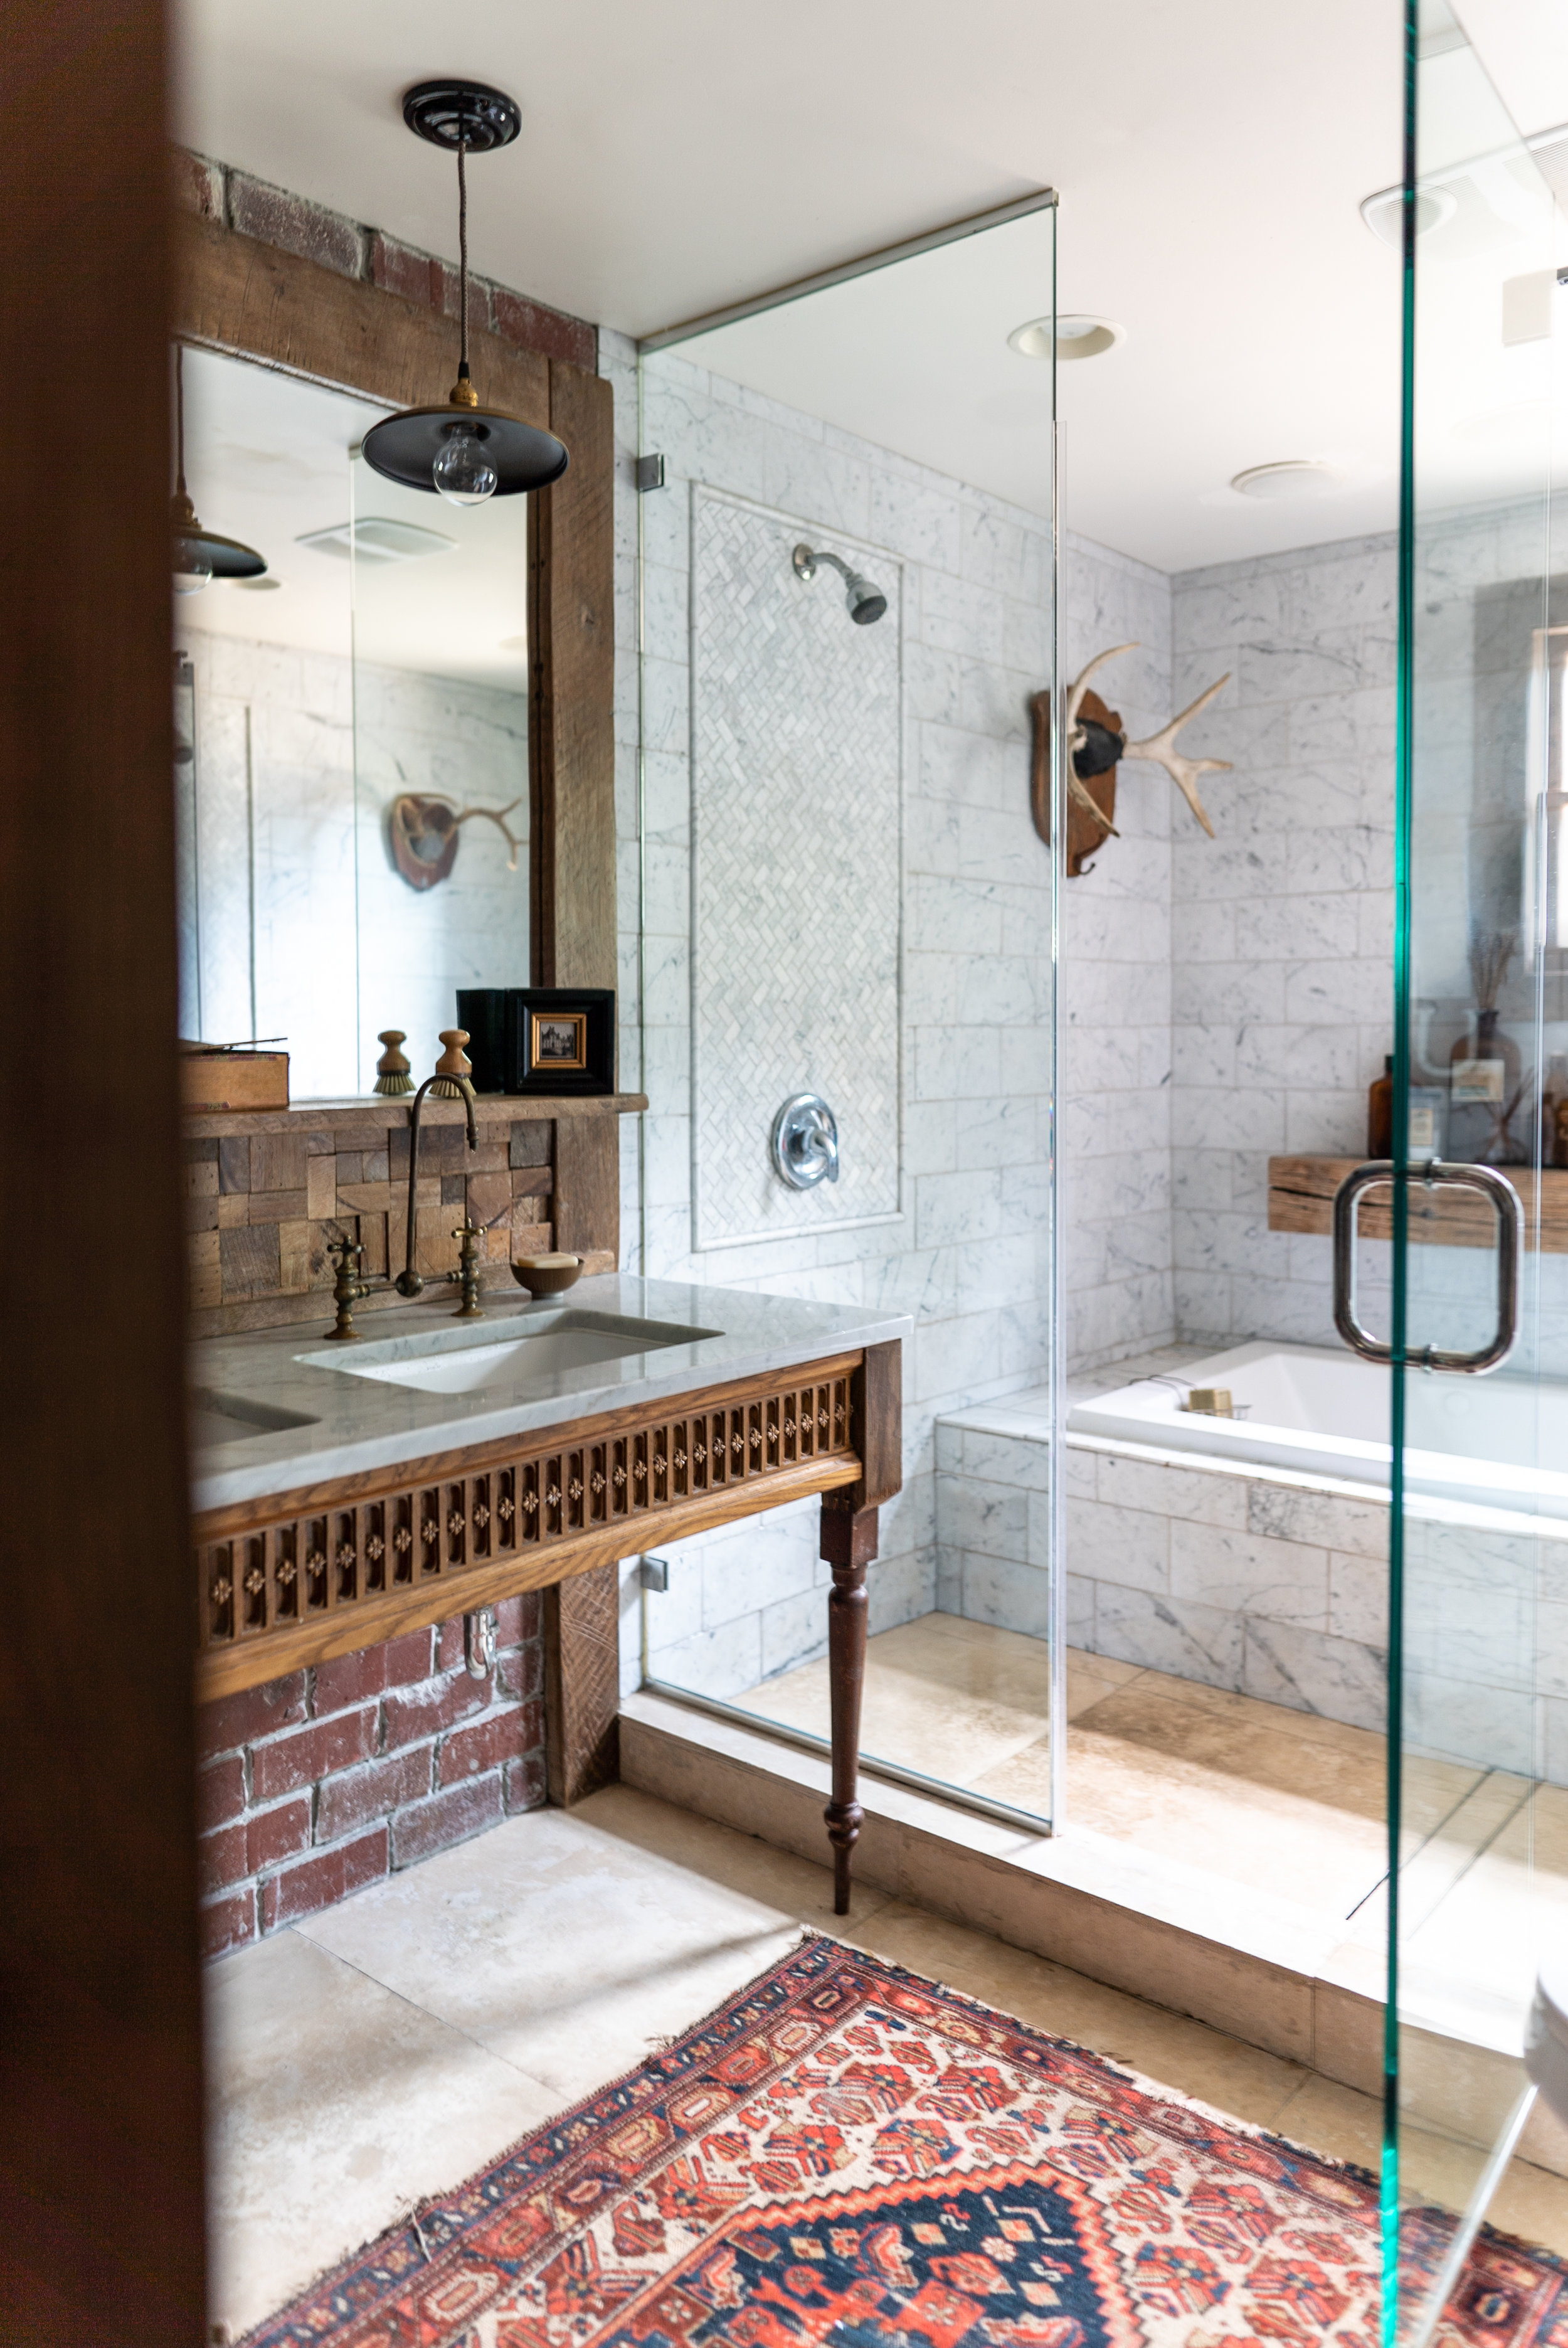 bathroom angle sink tub from closet-09908.jpg